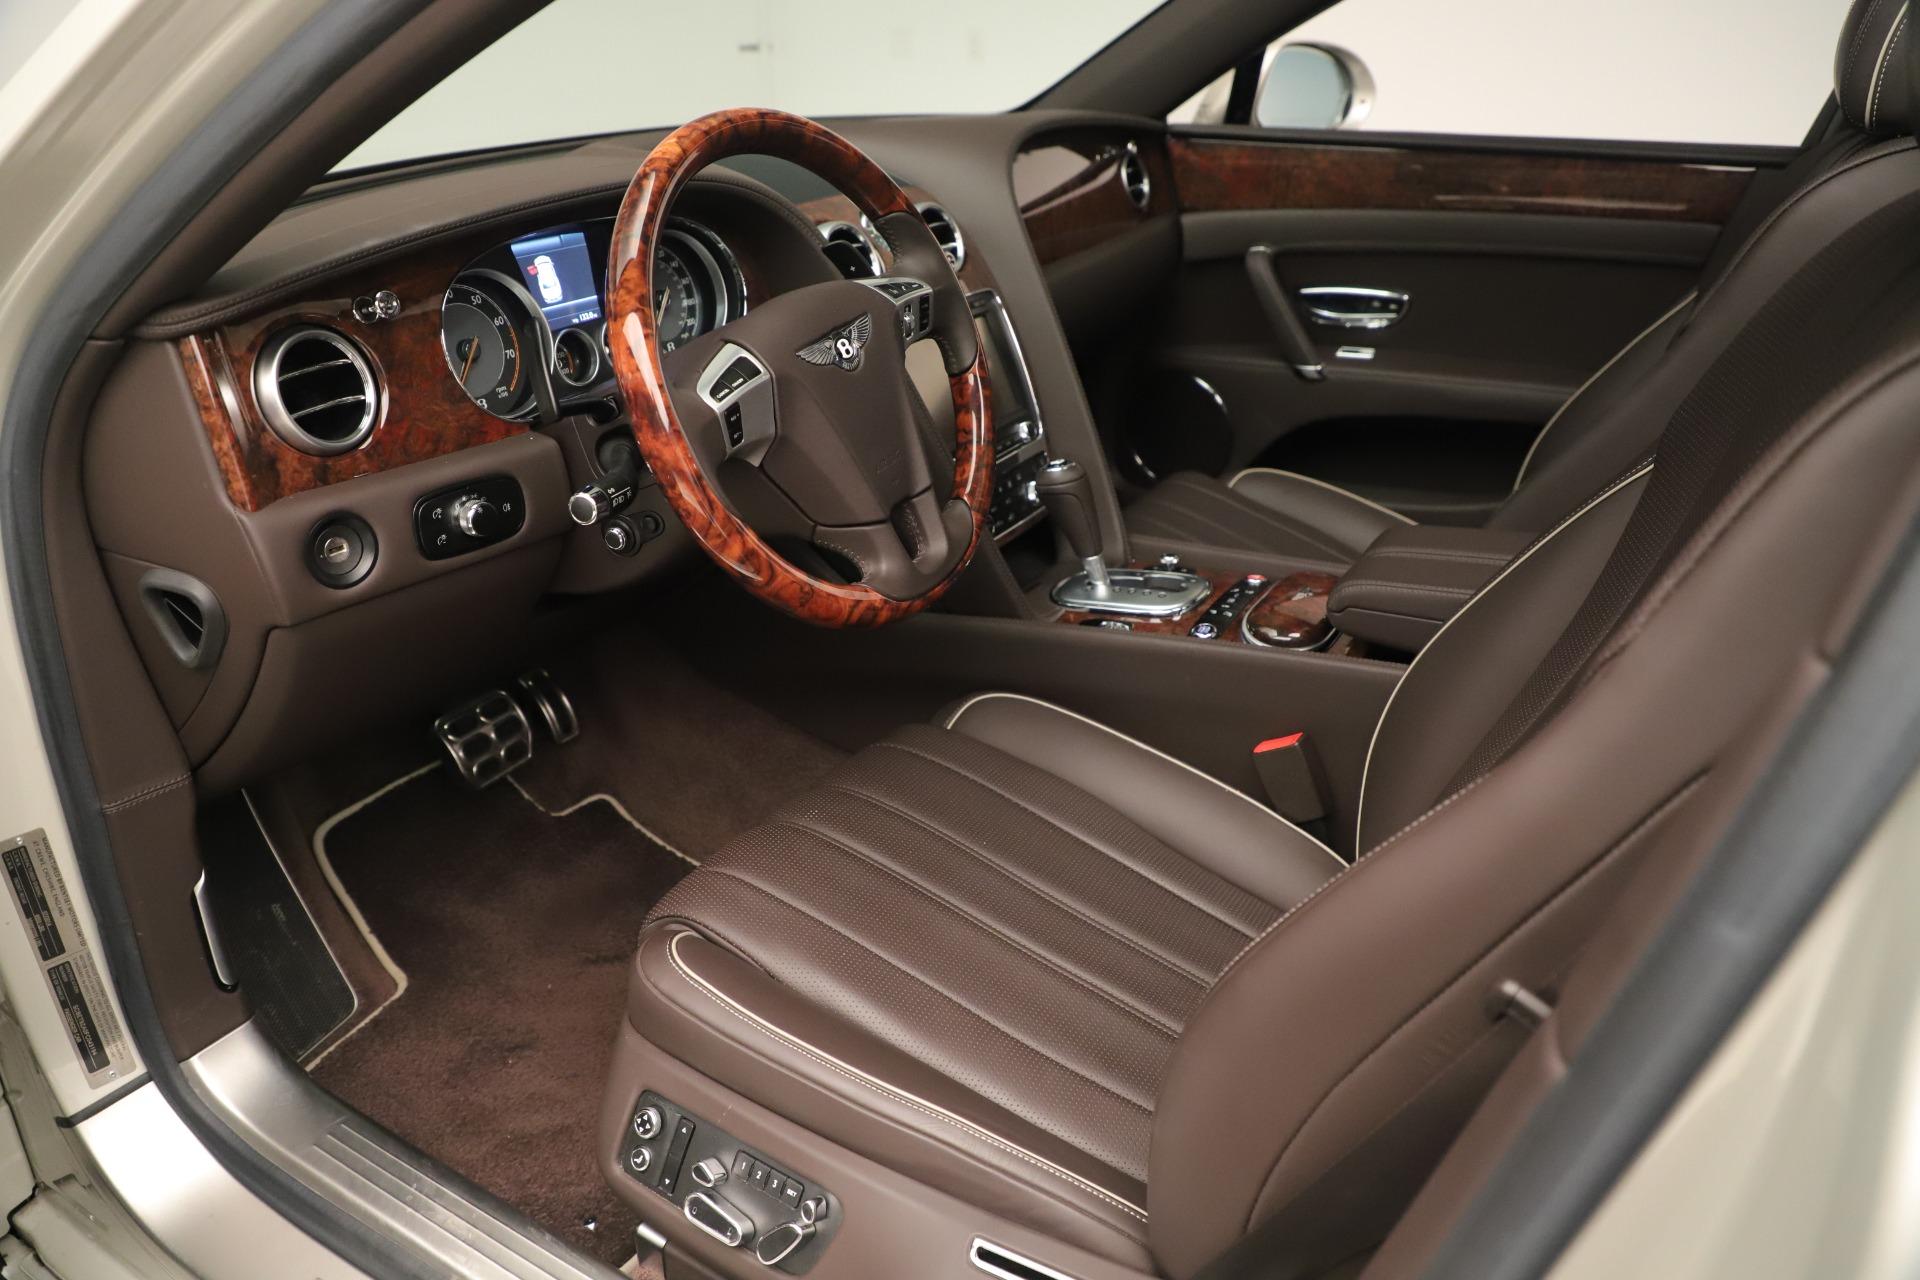 Used 2015 Bentley Flying Spur V8 For Sale In Westport, CT 3444_p16